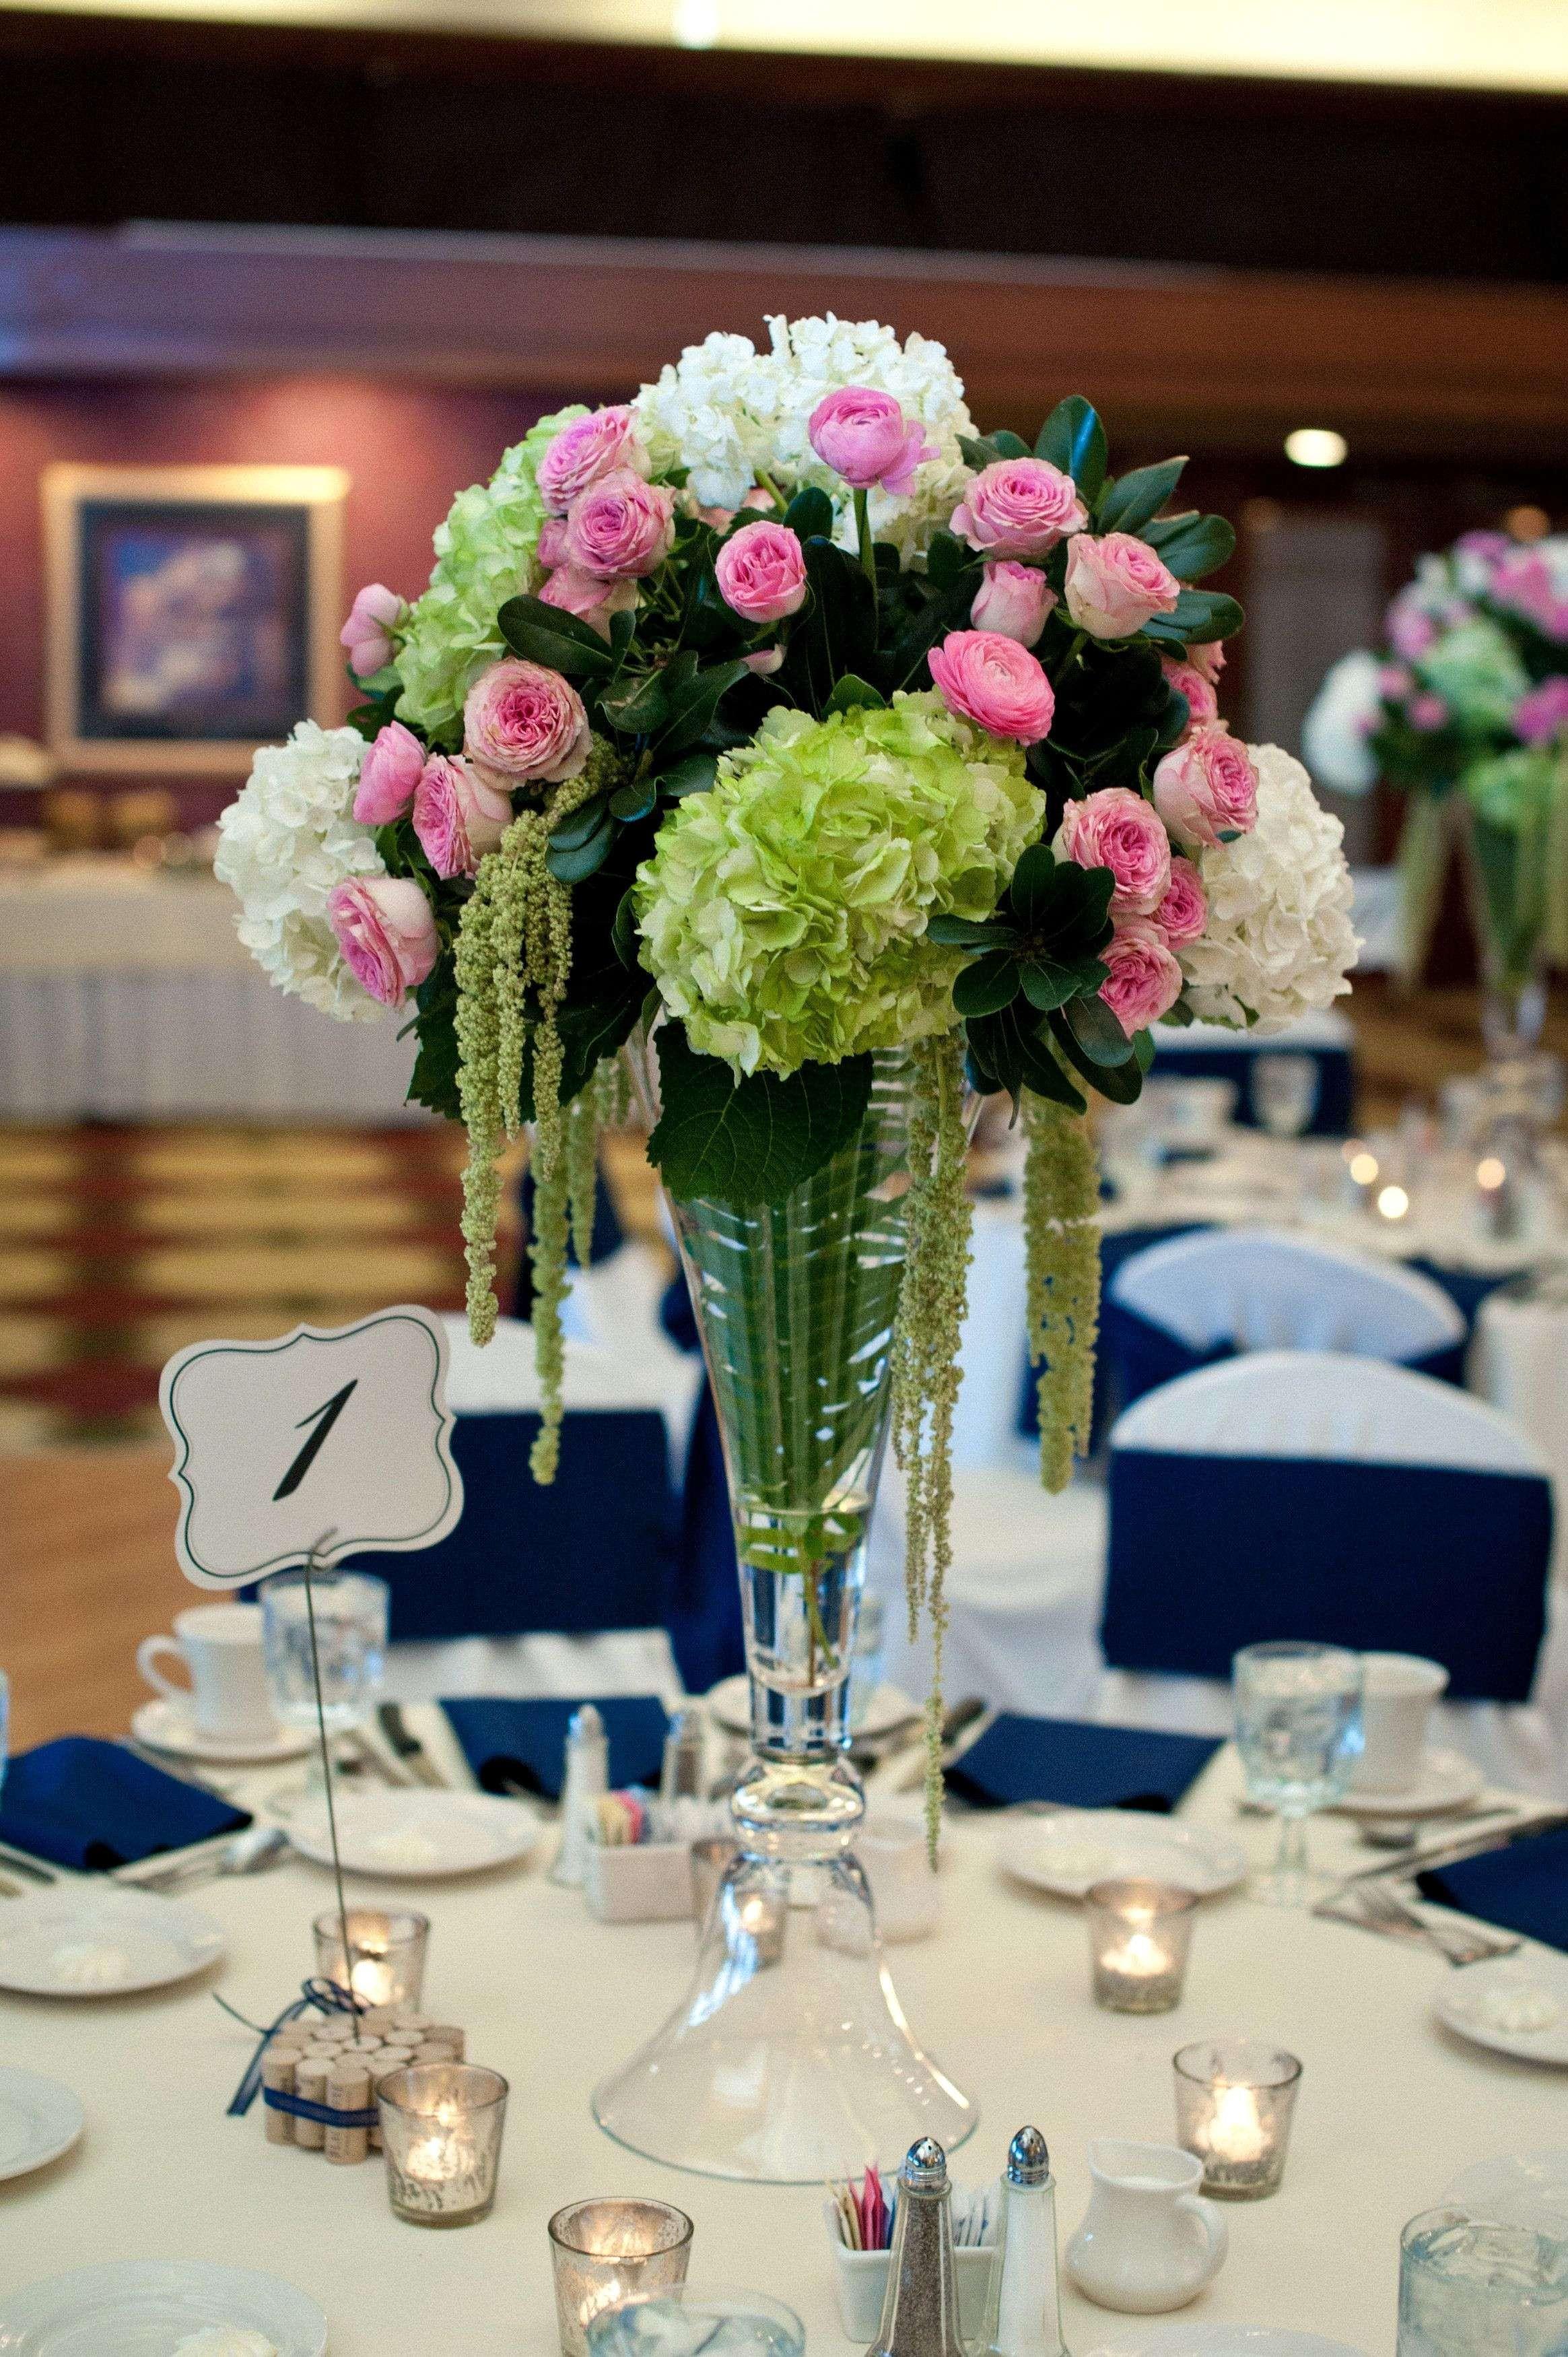 vases in bulk of diy table centerpieces best of bulk wedding decorations dsc h vases inside diy table centerpieces lovely easy wedding decorations new i pinimg originals 0d 55 ee design